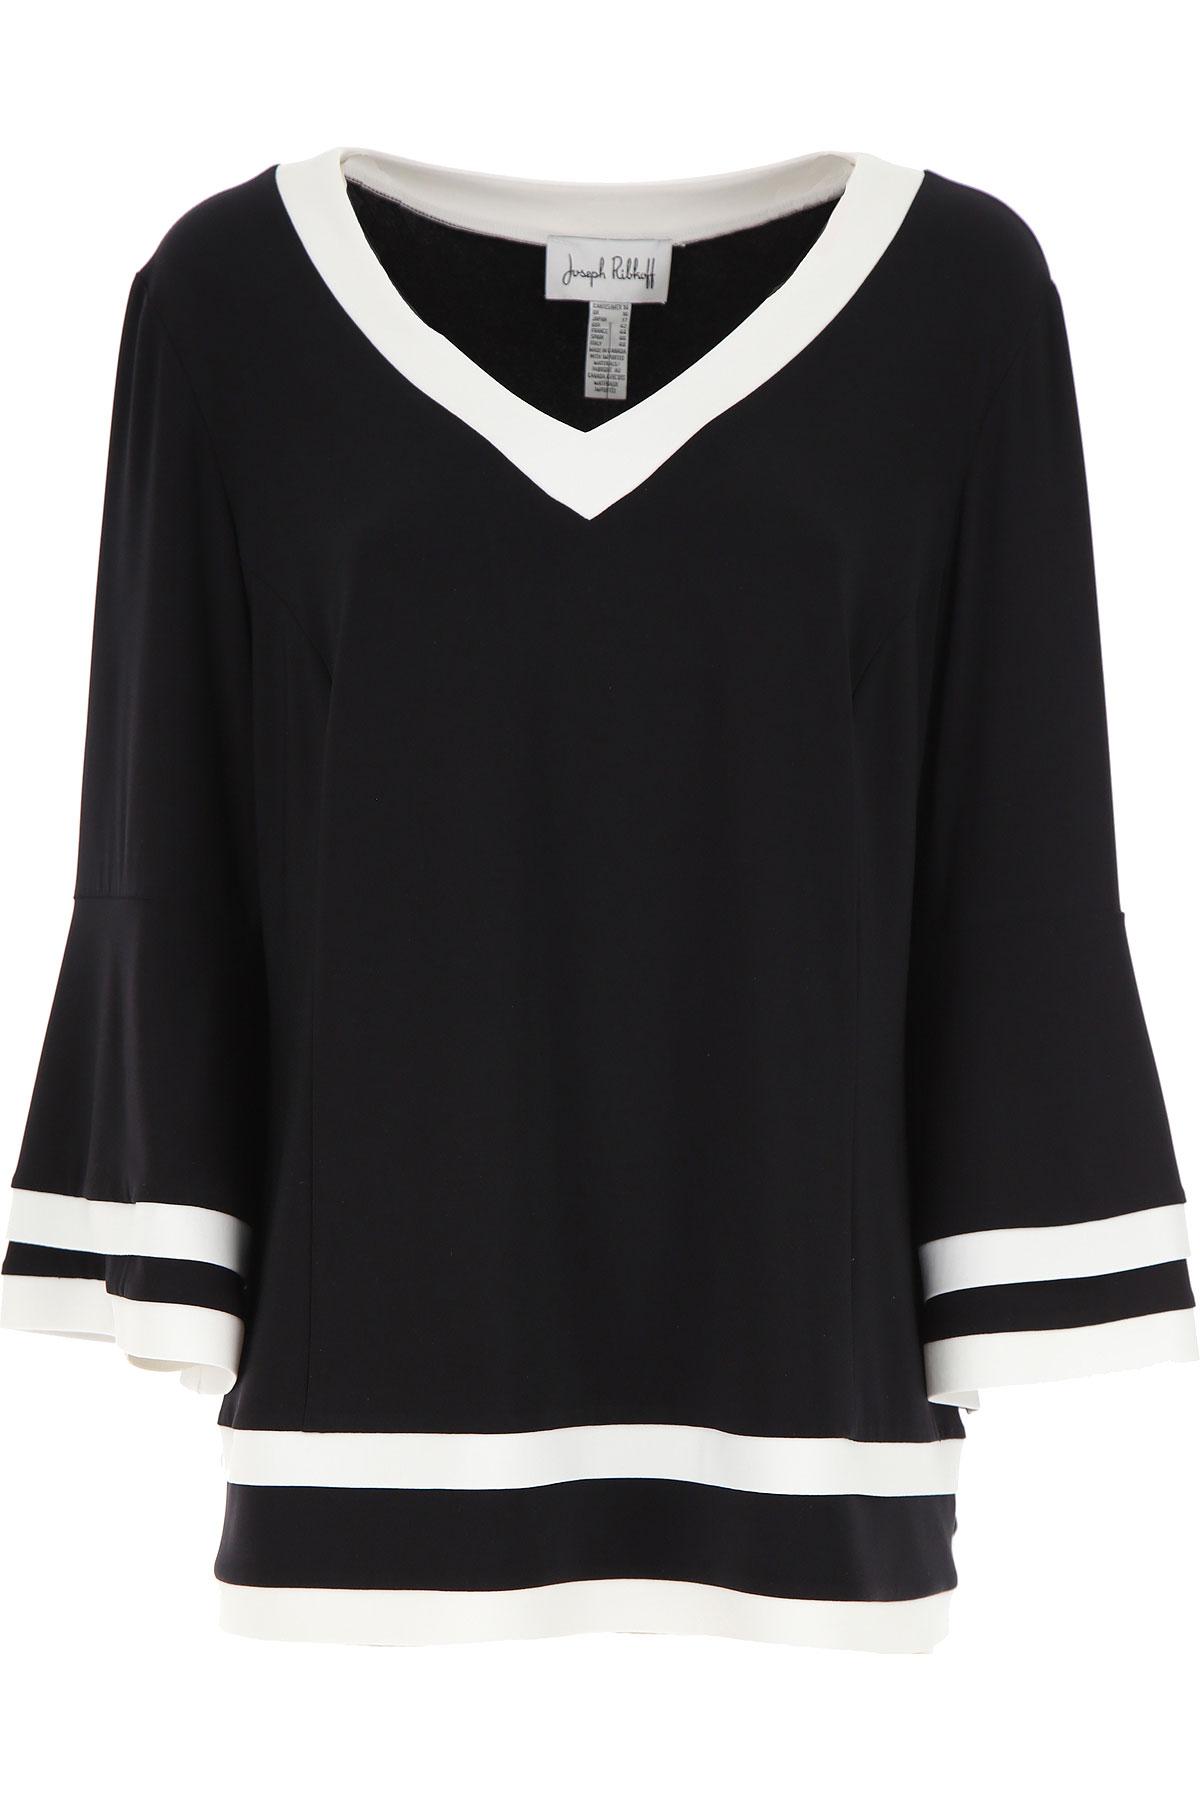 Joseph Ribkoff Sweater for Women Jumper On Sale, Black, polyester, 2019, 14 8